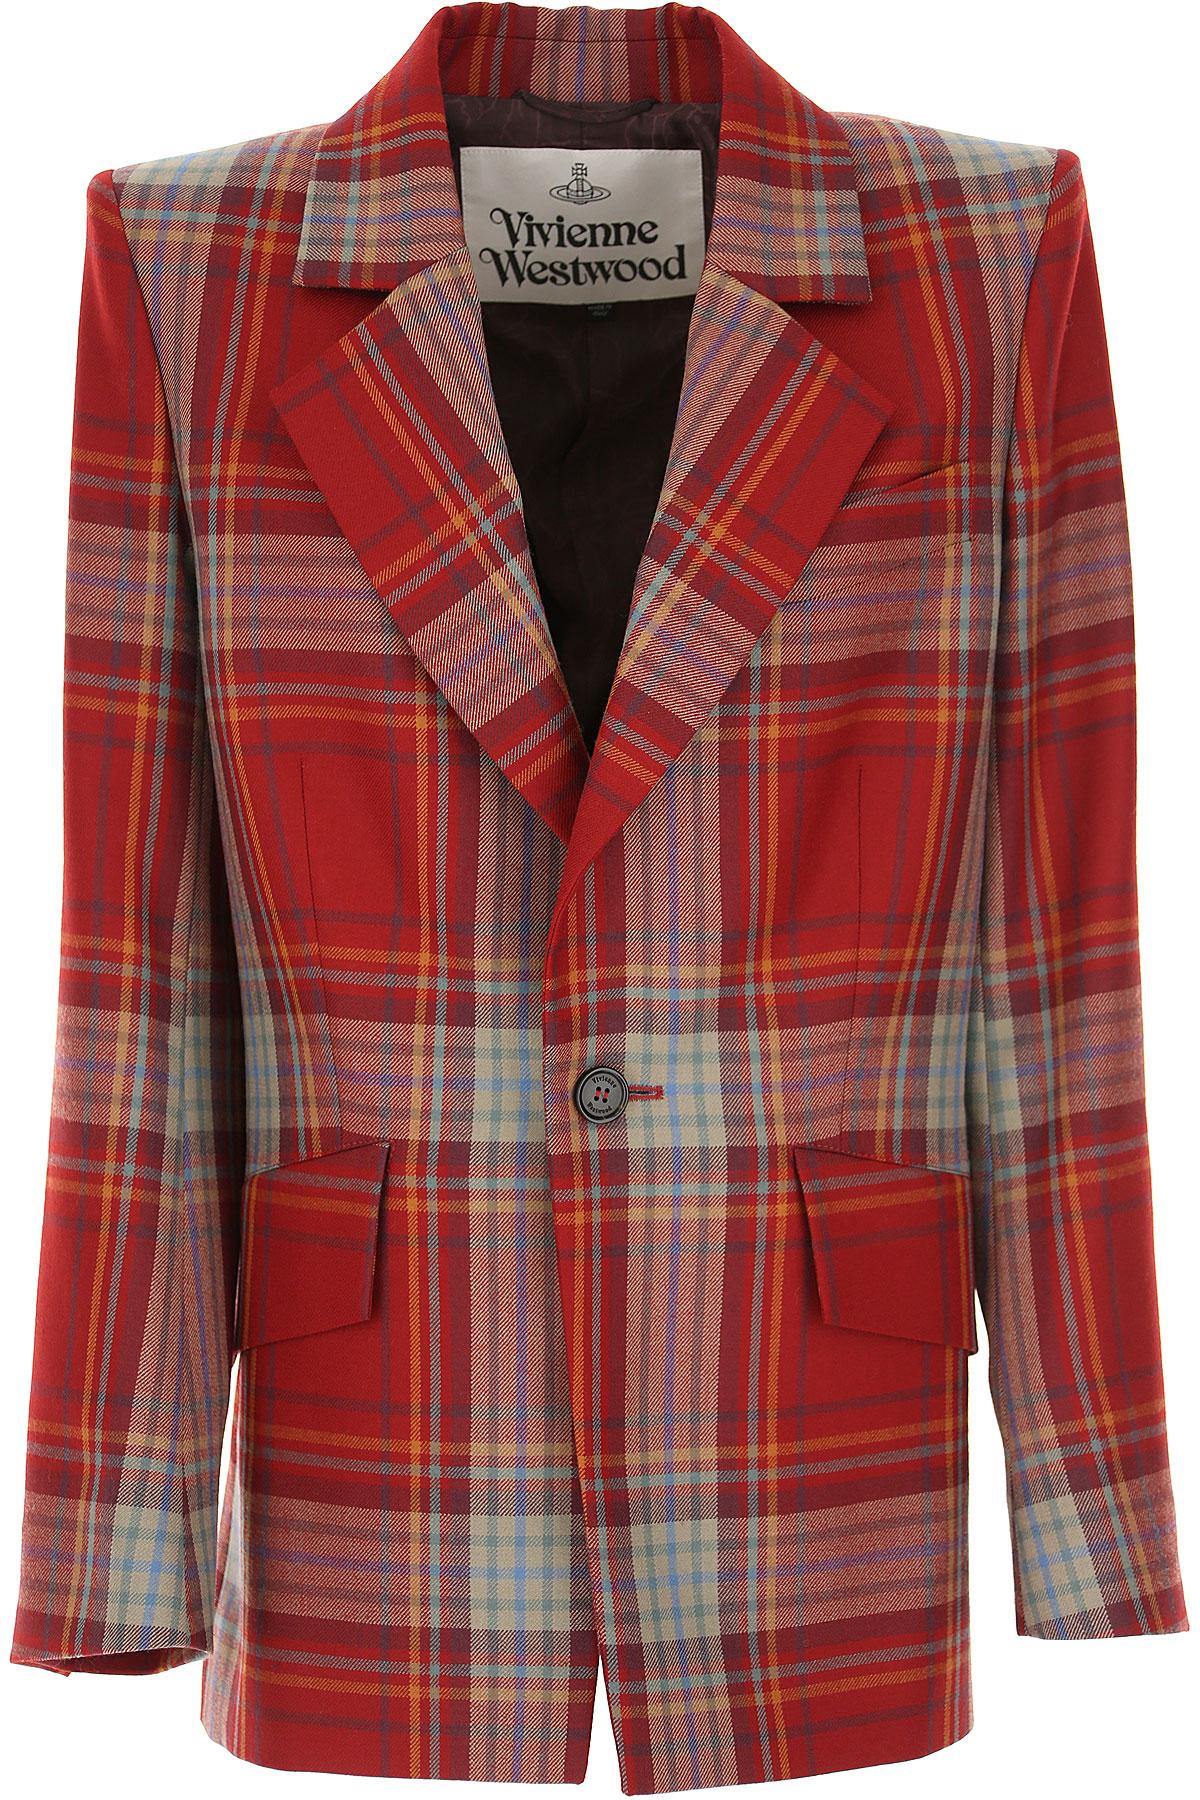 Vivienne Westwood Blazer for Women, Red, New Wool, 2019, 6 8